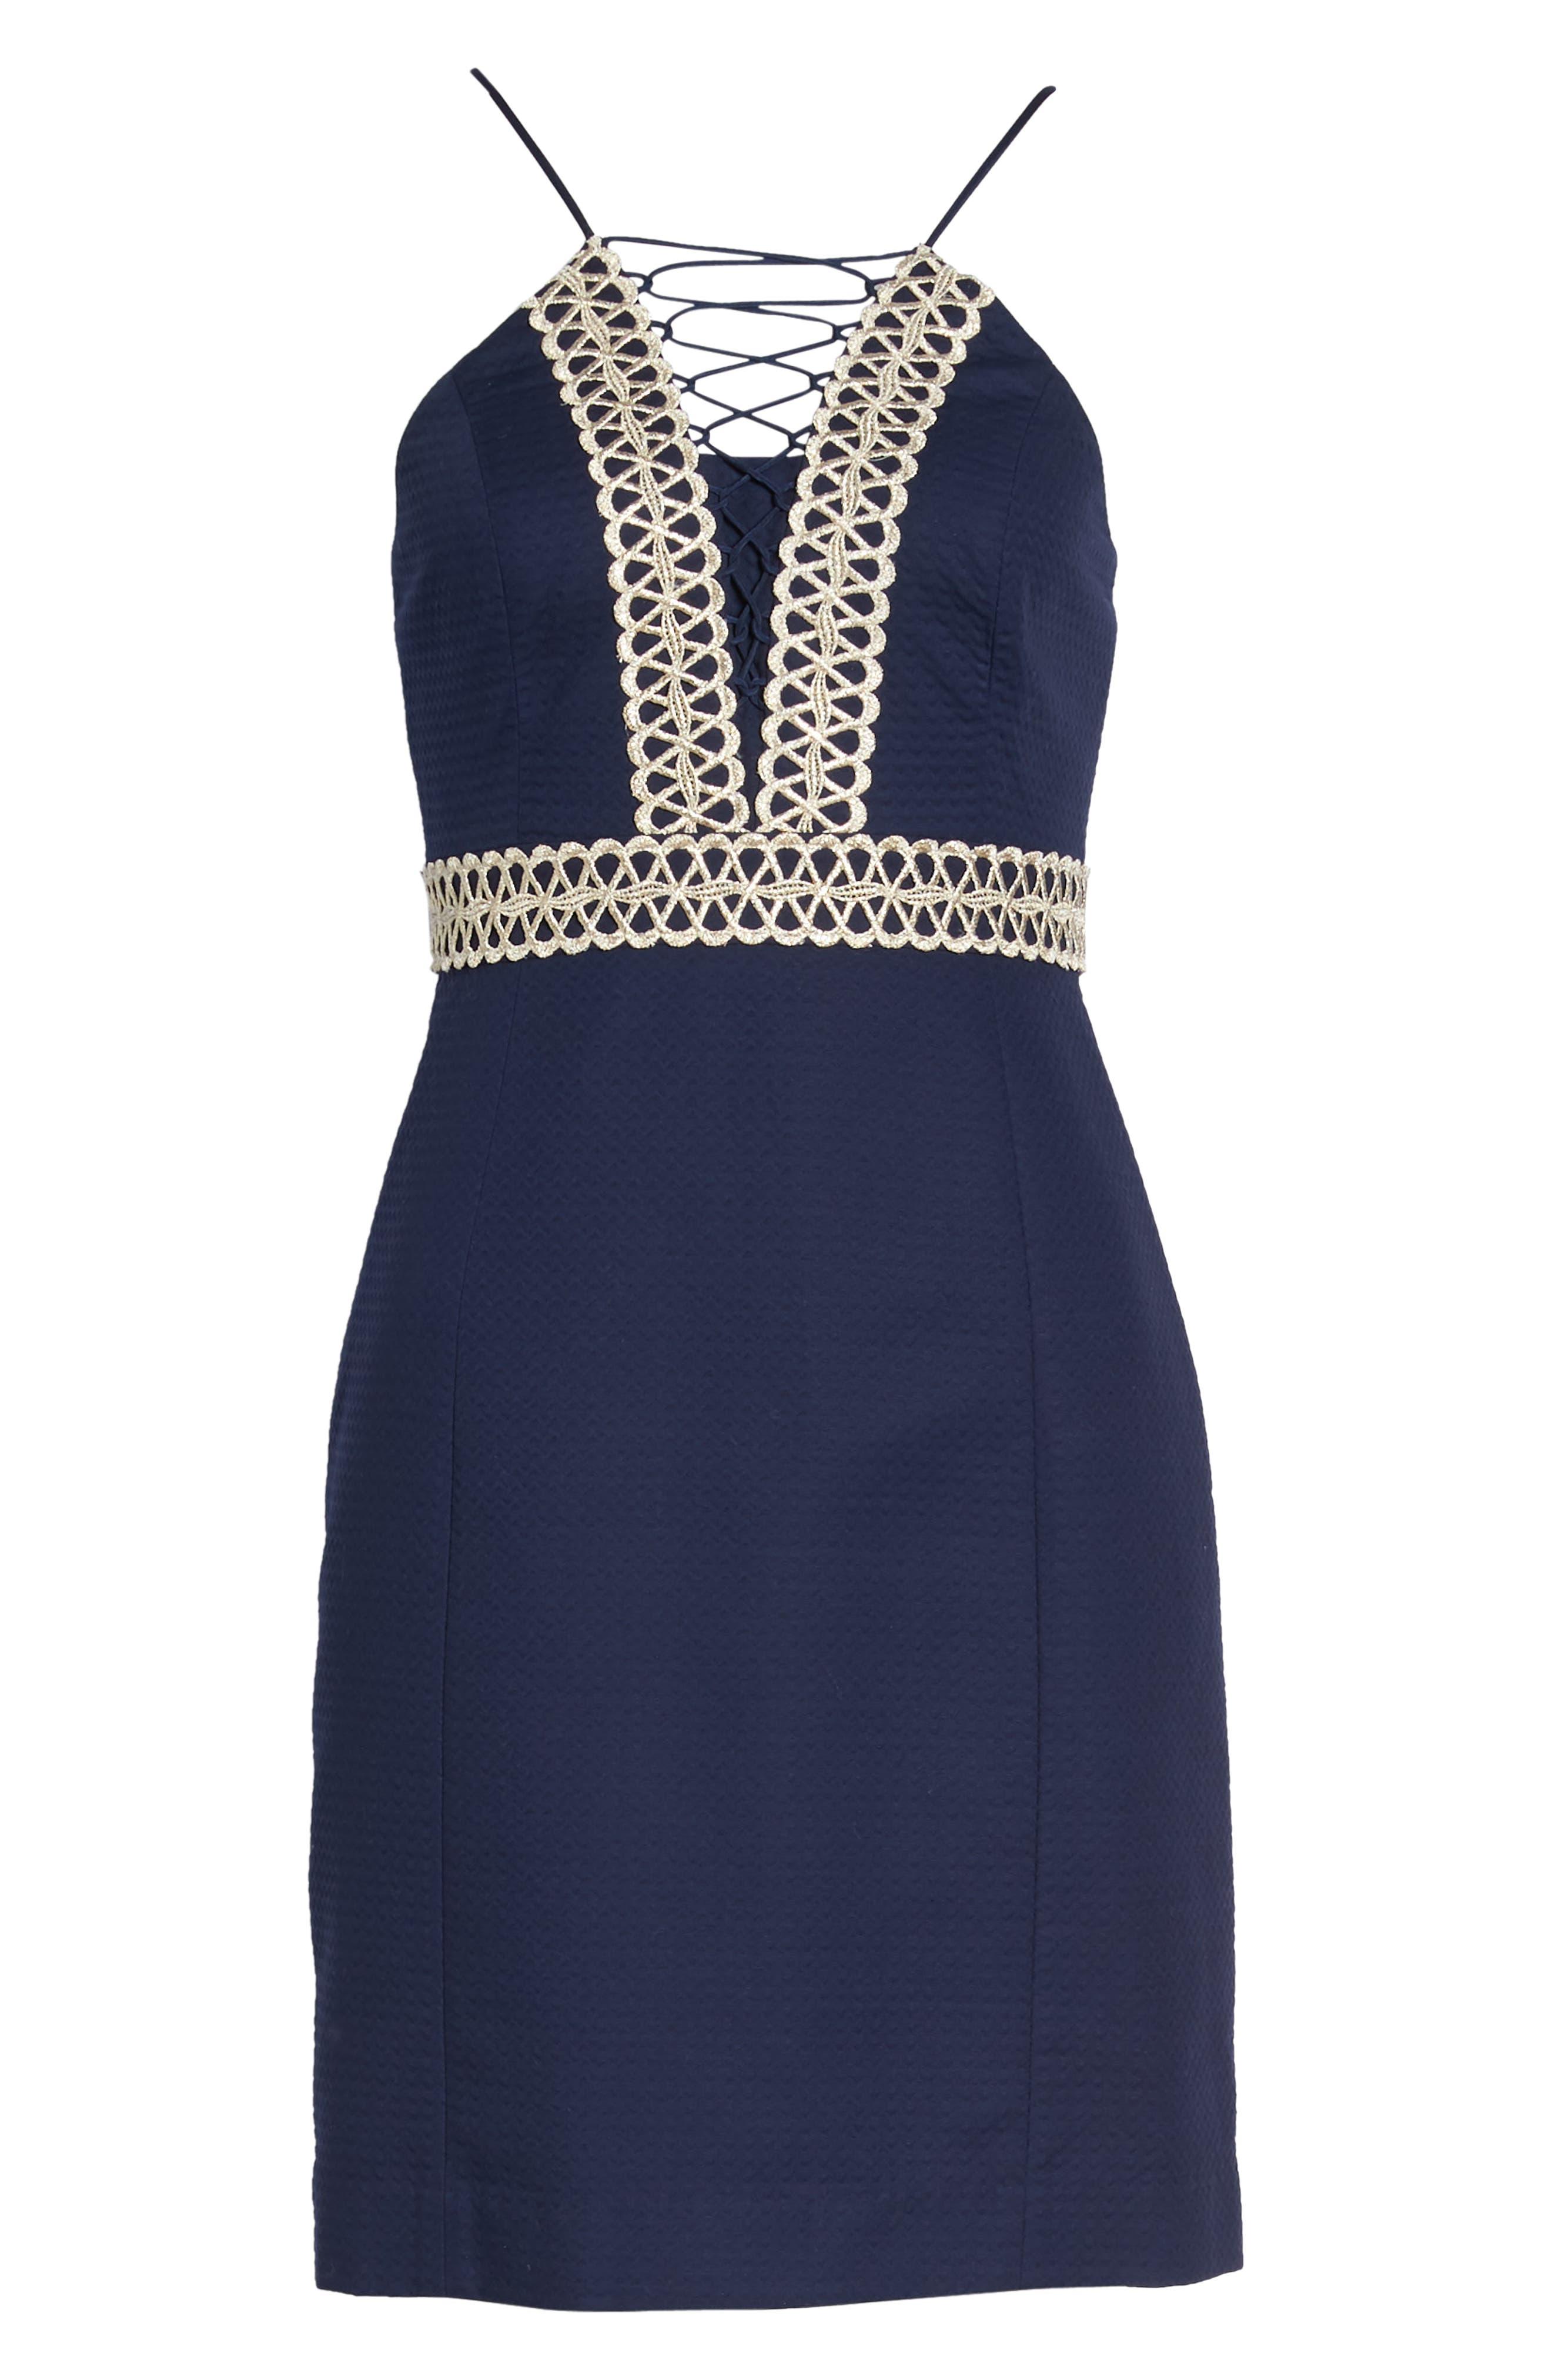 Trista Halter Sheath Dress,                             Alternate thumbnail 6, color,                             True Navy